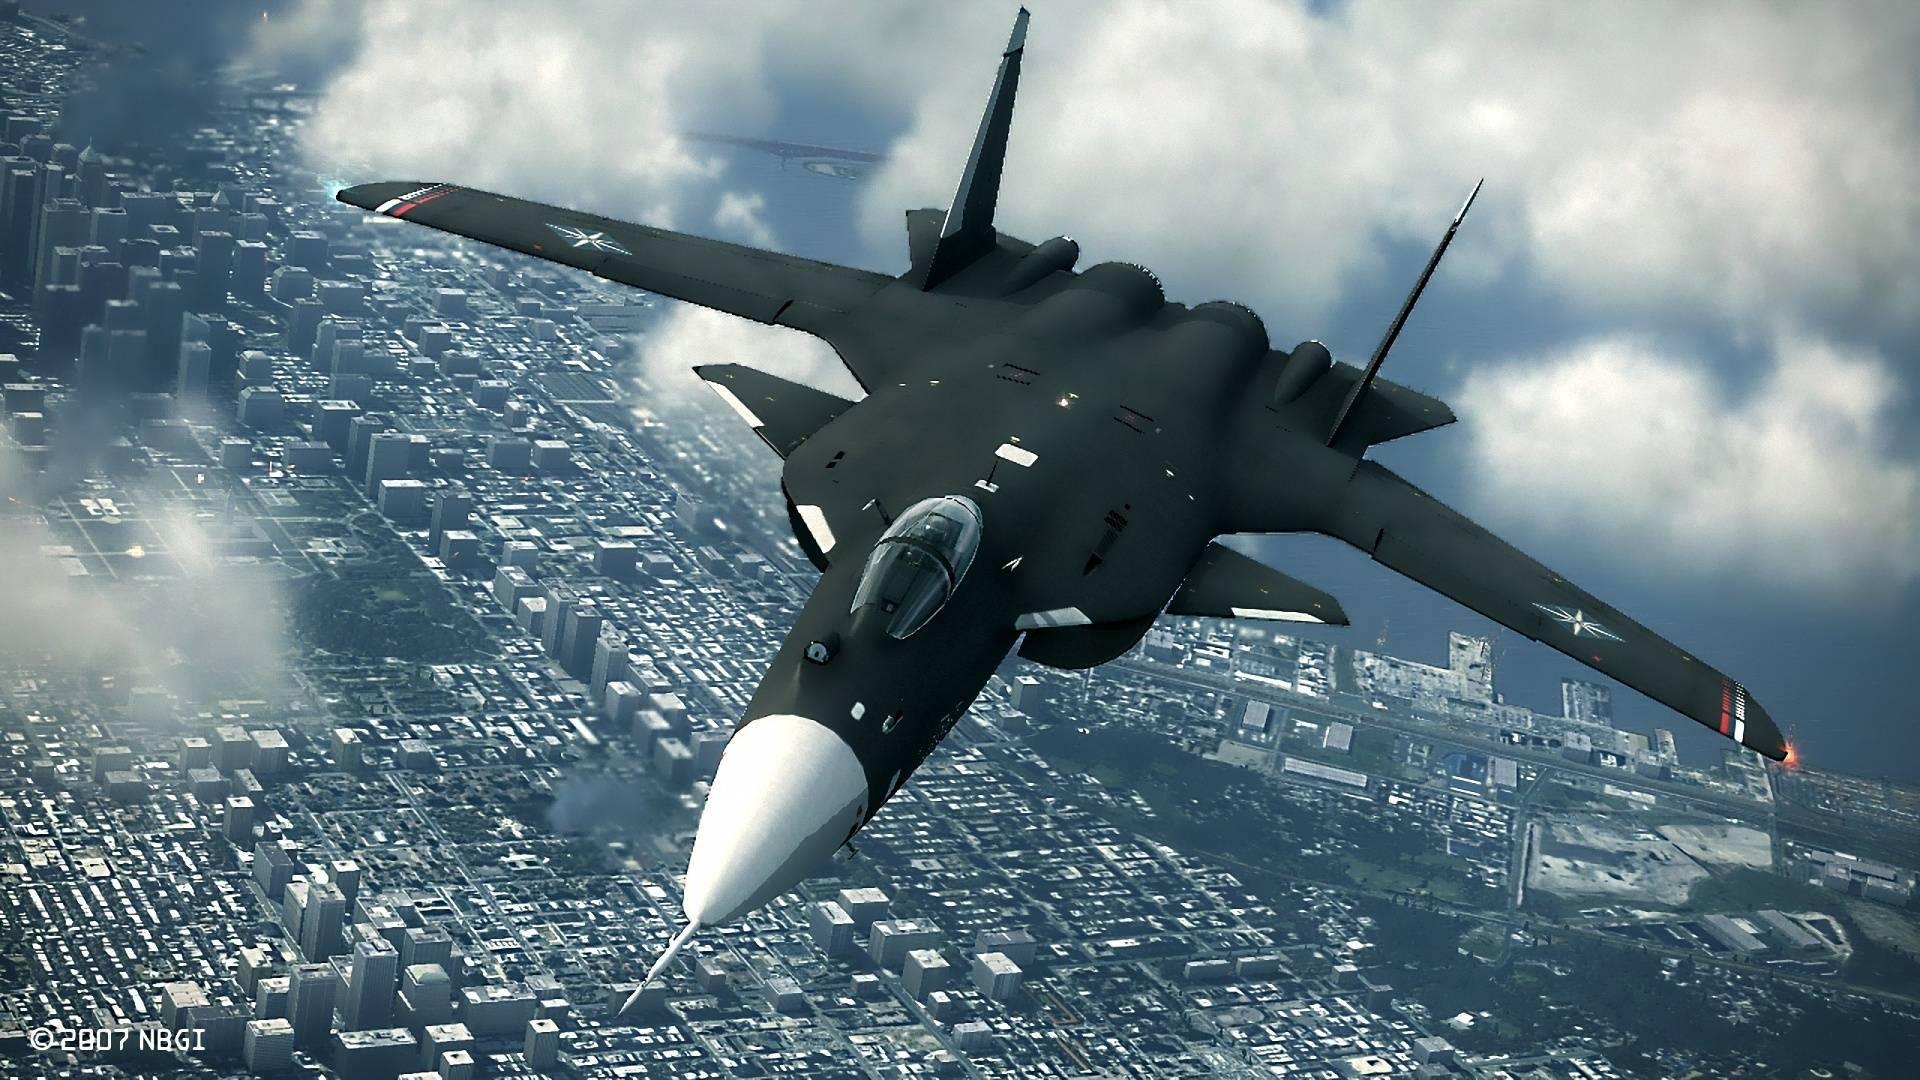 Самолет су-47«беркут». фото. история. характеристики.